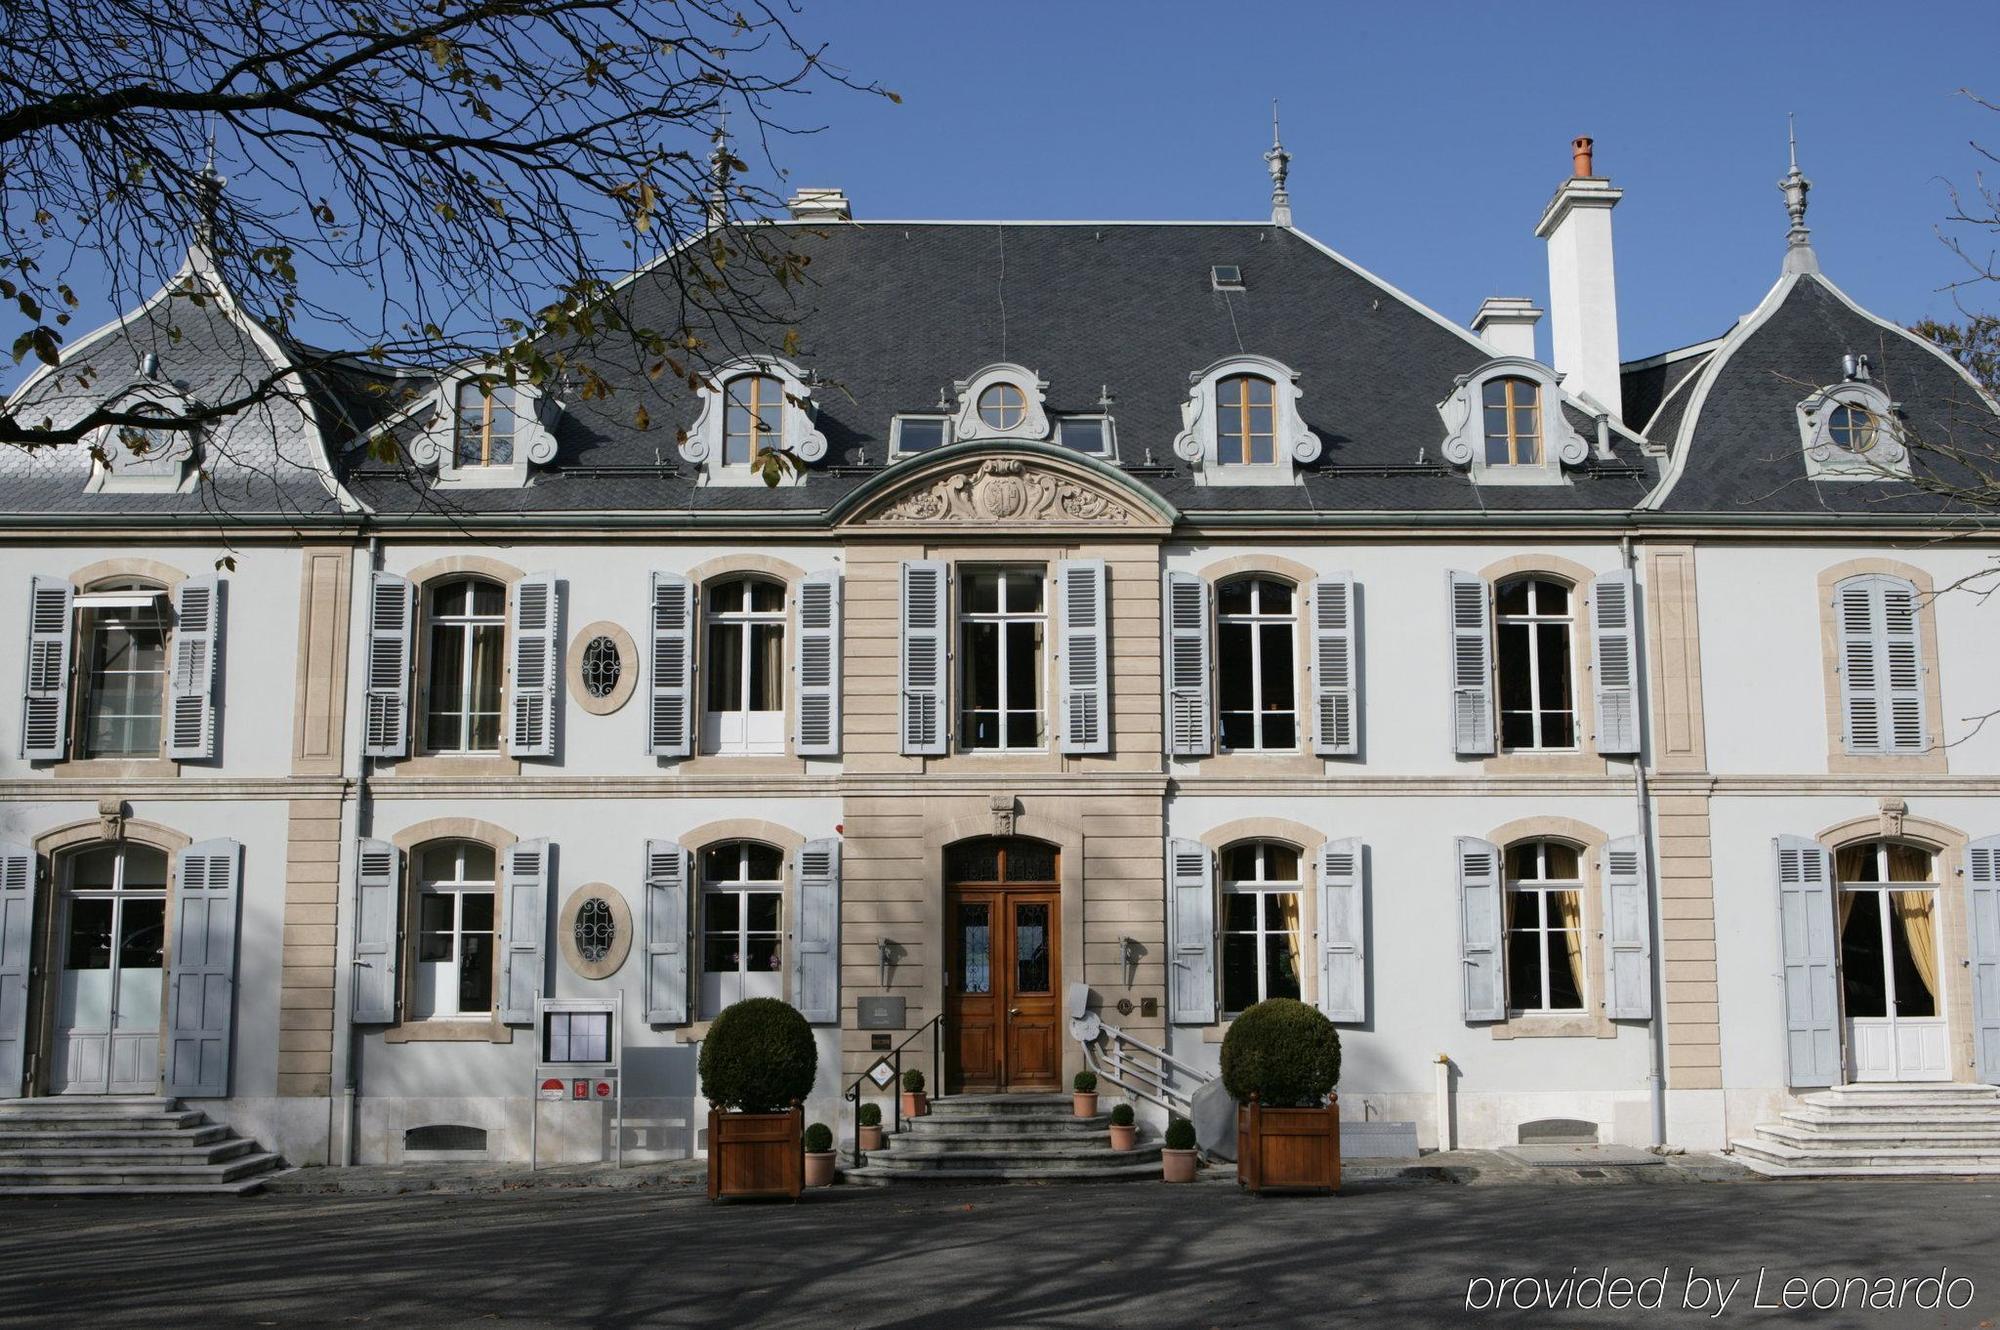 Hotel swissotel parc des eaux vives geneva geneva for Hotels geneve